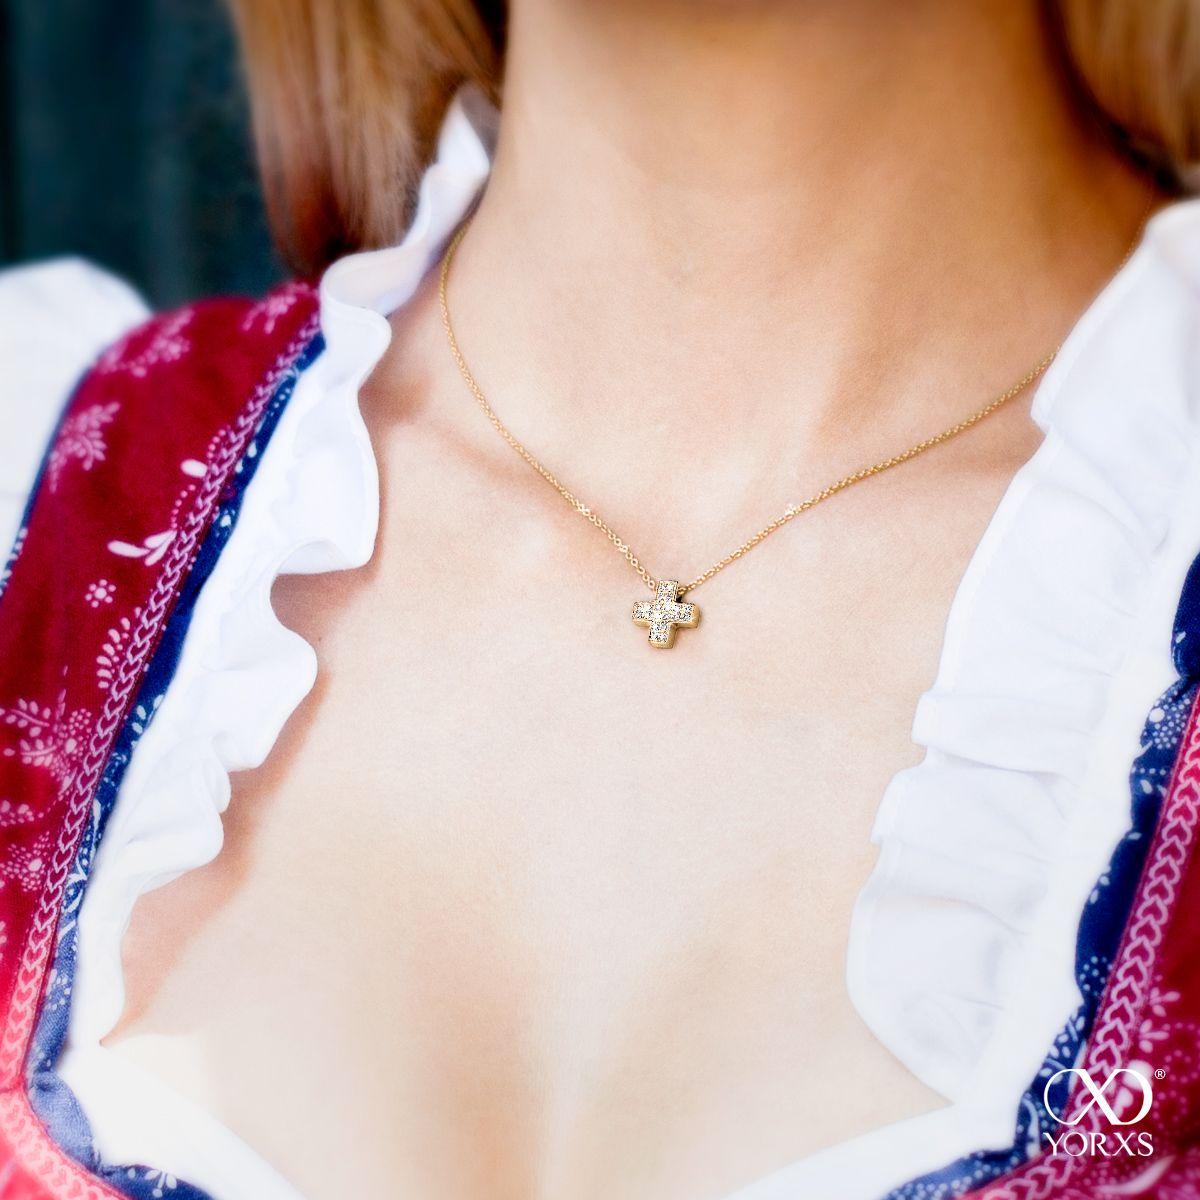 Today the bavarian Oktoberfest is beginning. What jewelry are you going to wear? #yorxs #diamanten #diamantschmuck #kette #wiesn